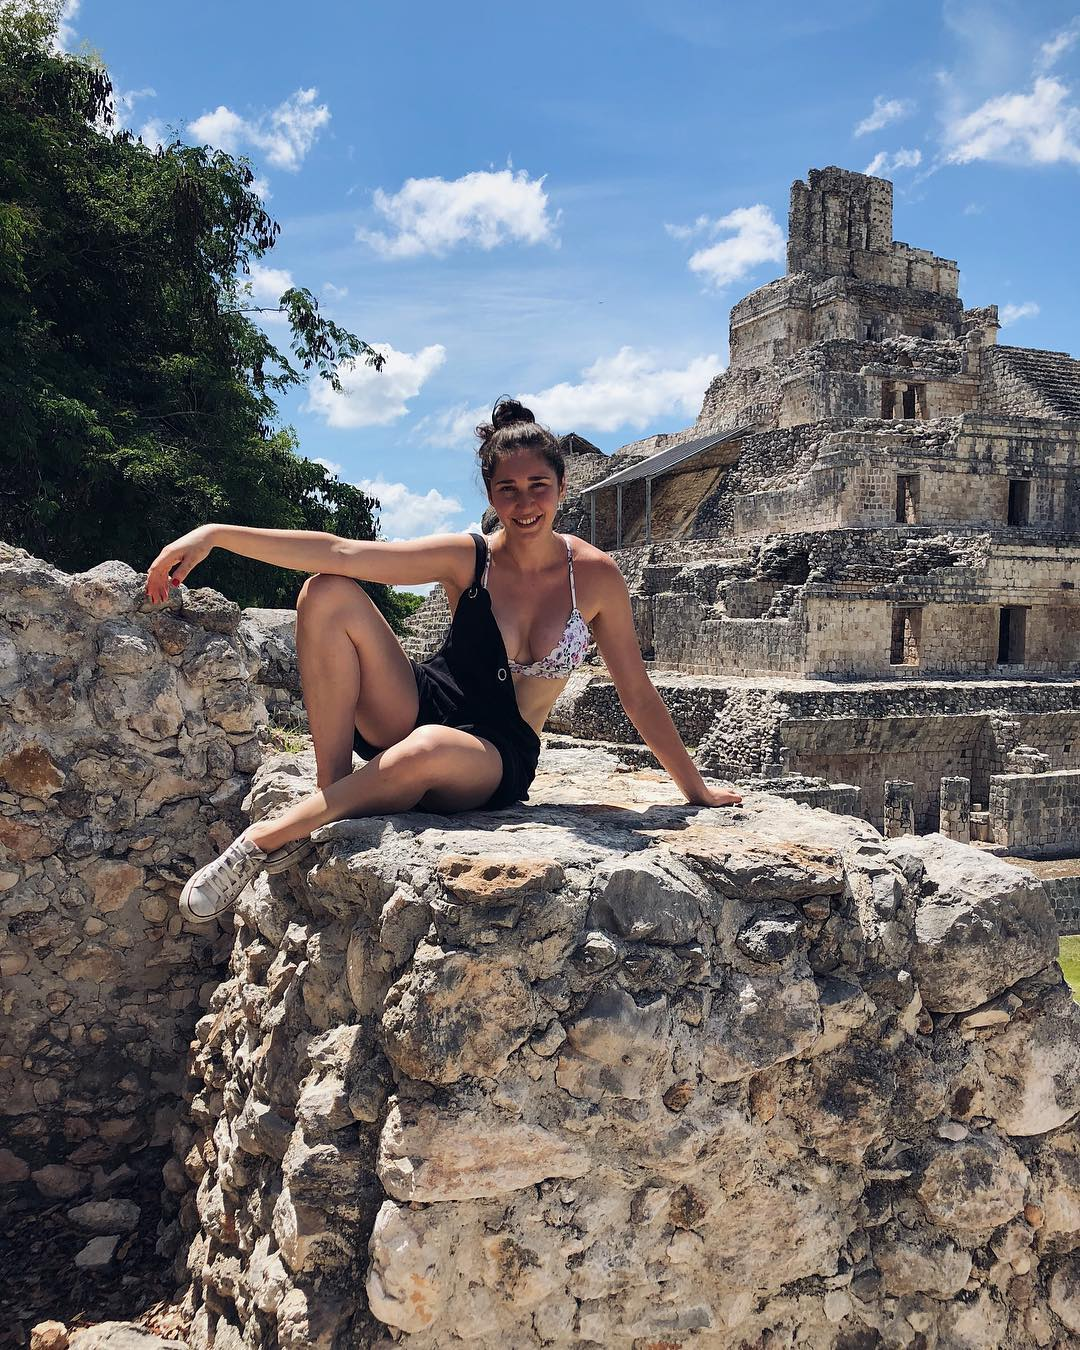 zona arqueologica edzna campeche, top yucatan, yucatan peninsula